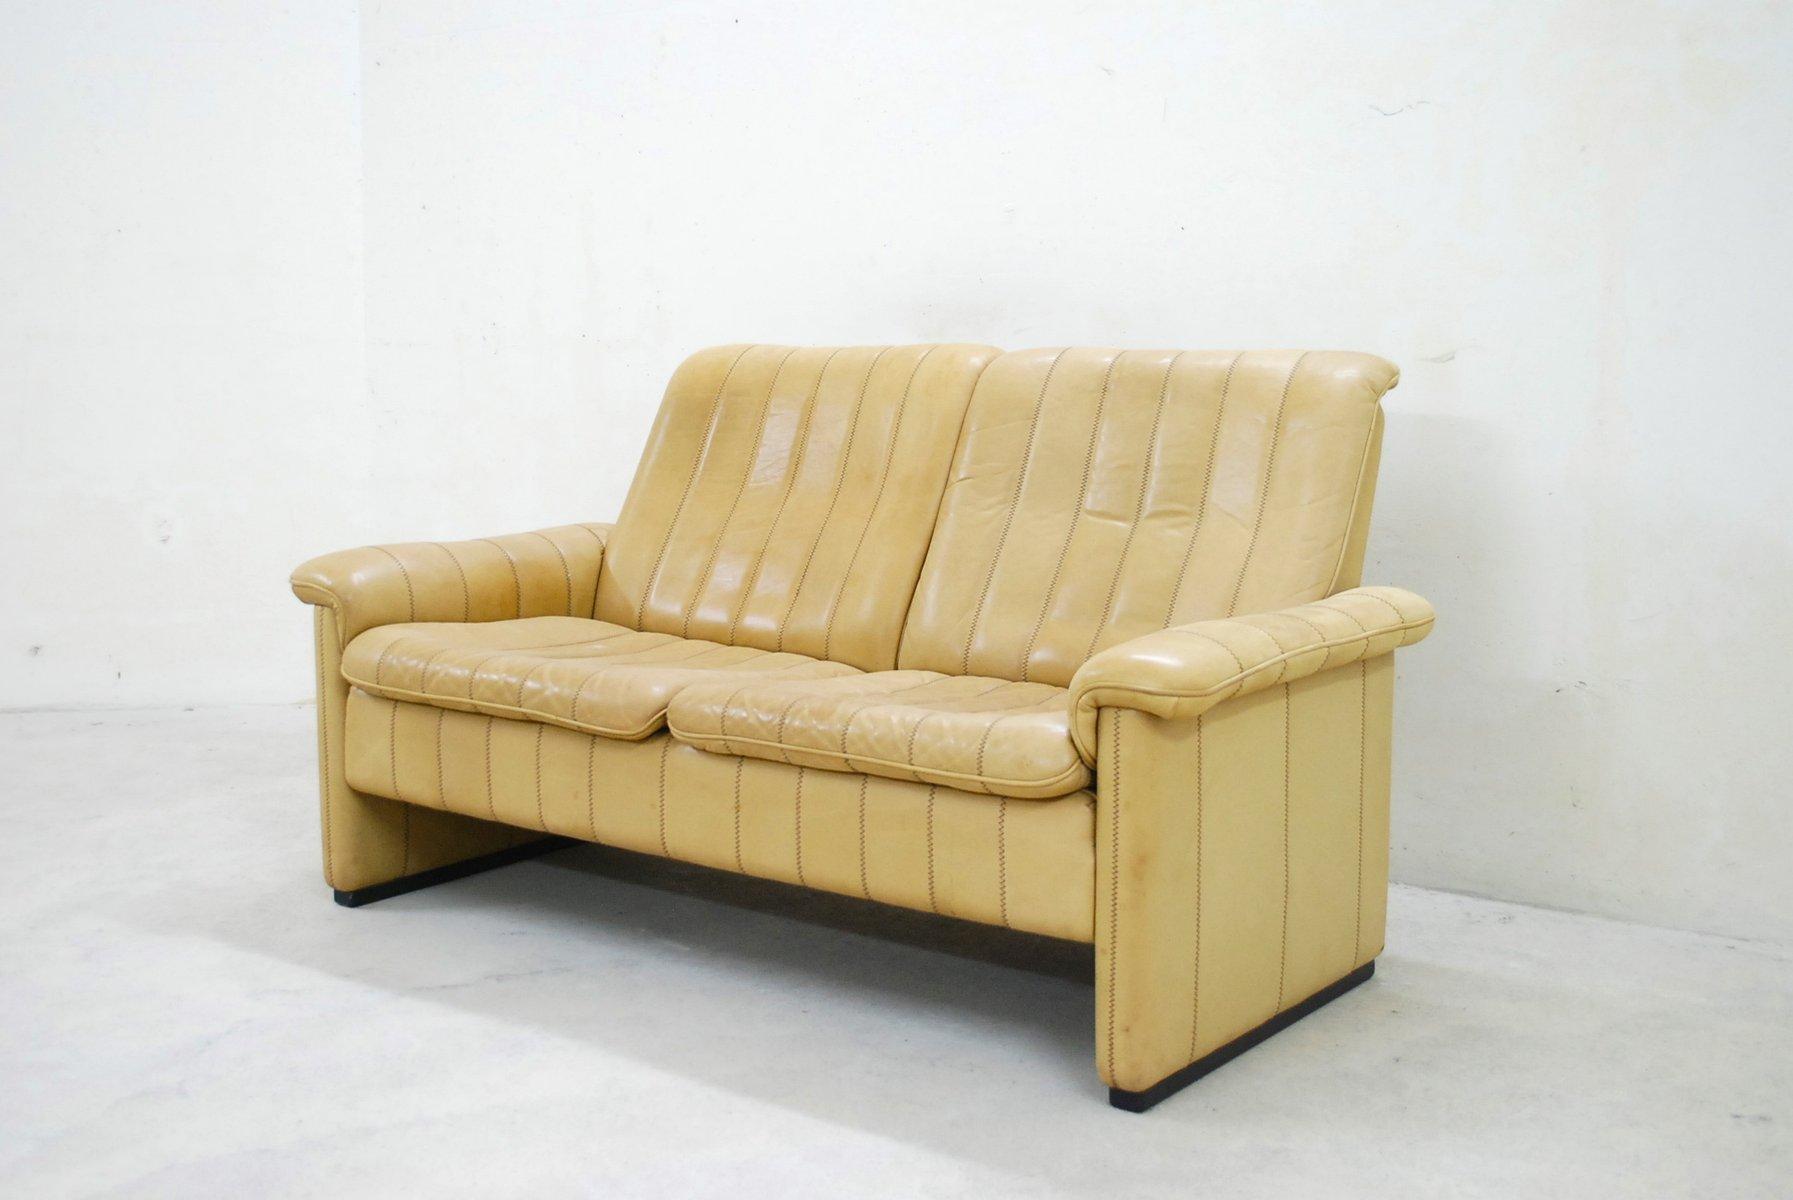 schweizer leder sofa von de sede 1980er bei pamono kaufen. Black Bedroom Furniture Sets. Home Design Ideas